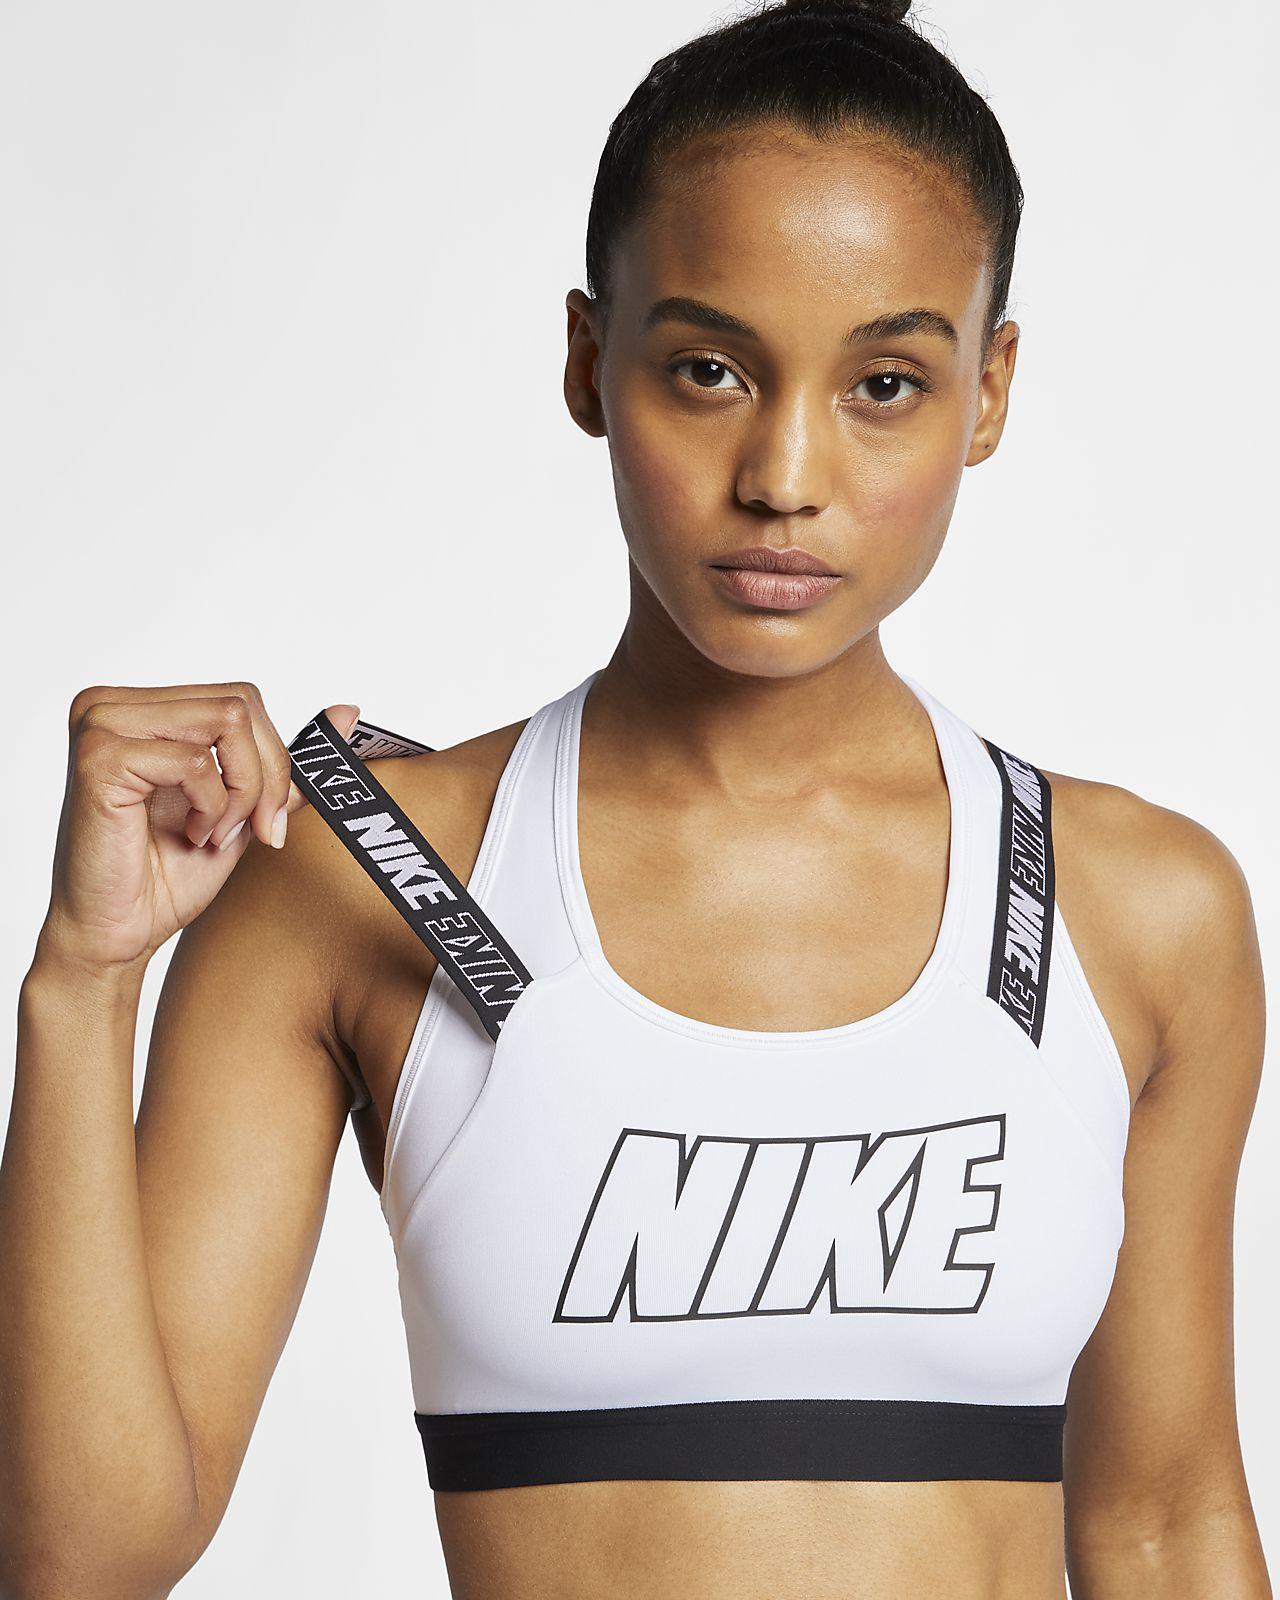 843535a2dc40 Nike Victory Women's Medium Support Sports Bra. Nike.com